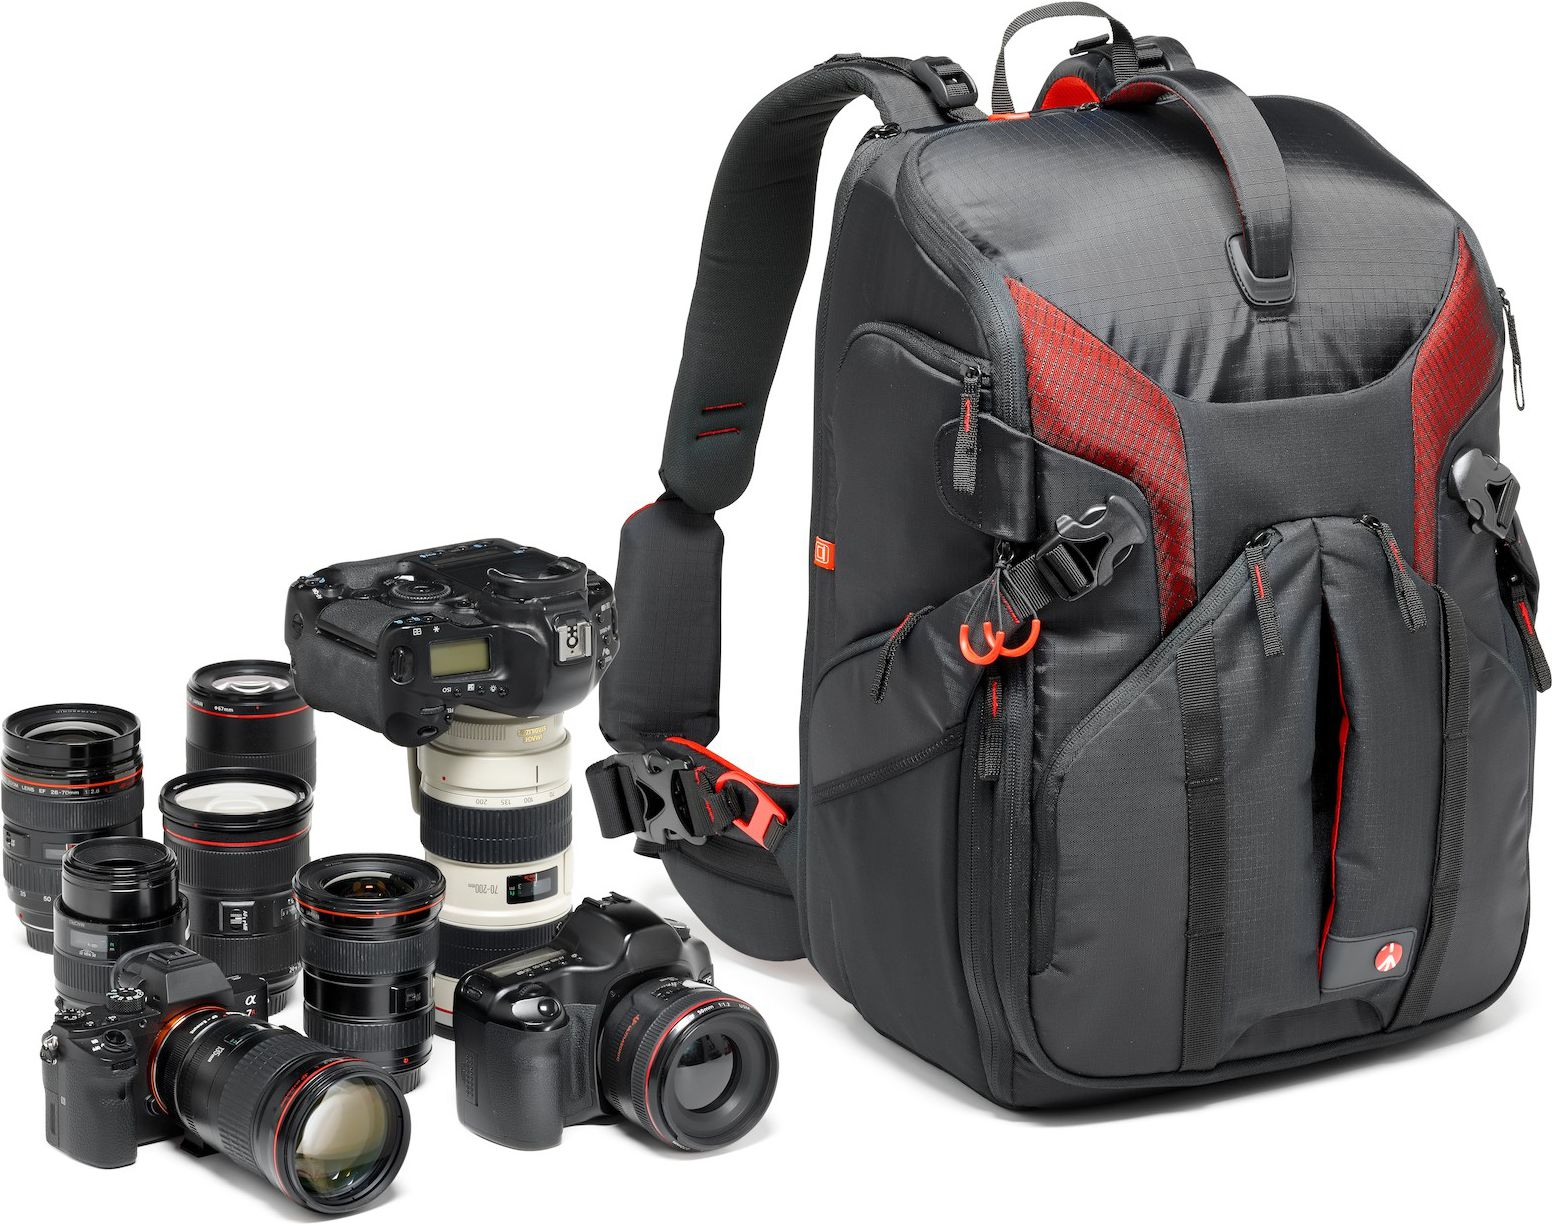 c150f94a88ffd Jaki plecak na aparat (Nikon, Canon) i laptopa? Polecane modele ...